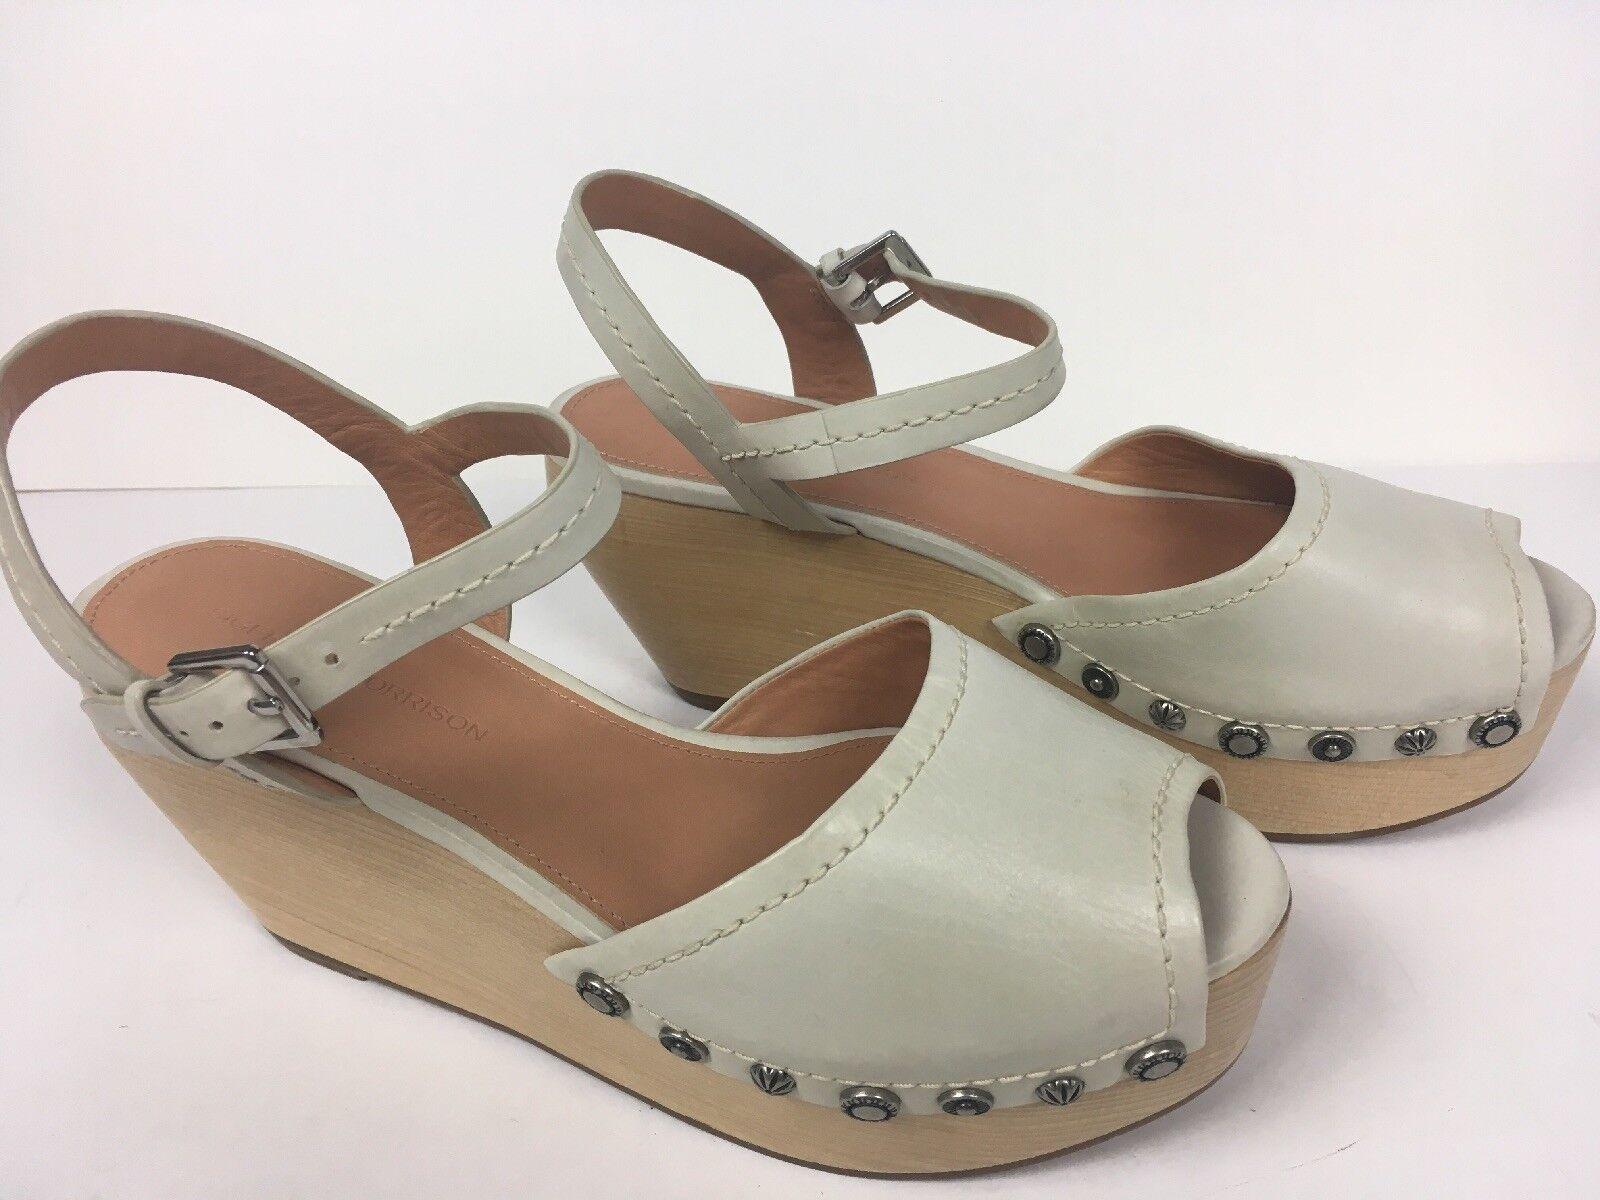 punto vendita Sigerson Morrison Morrison Morrison donna Clogs Wedge Studs Platform Ankle Buckles scarpe Dimensione 9 B  comodamente